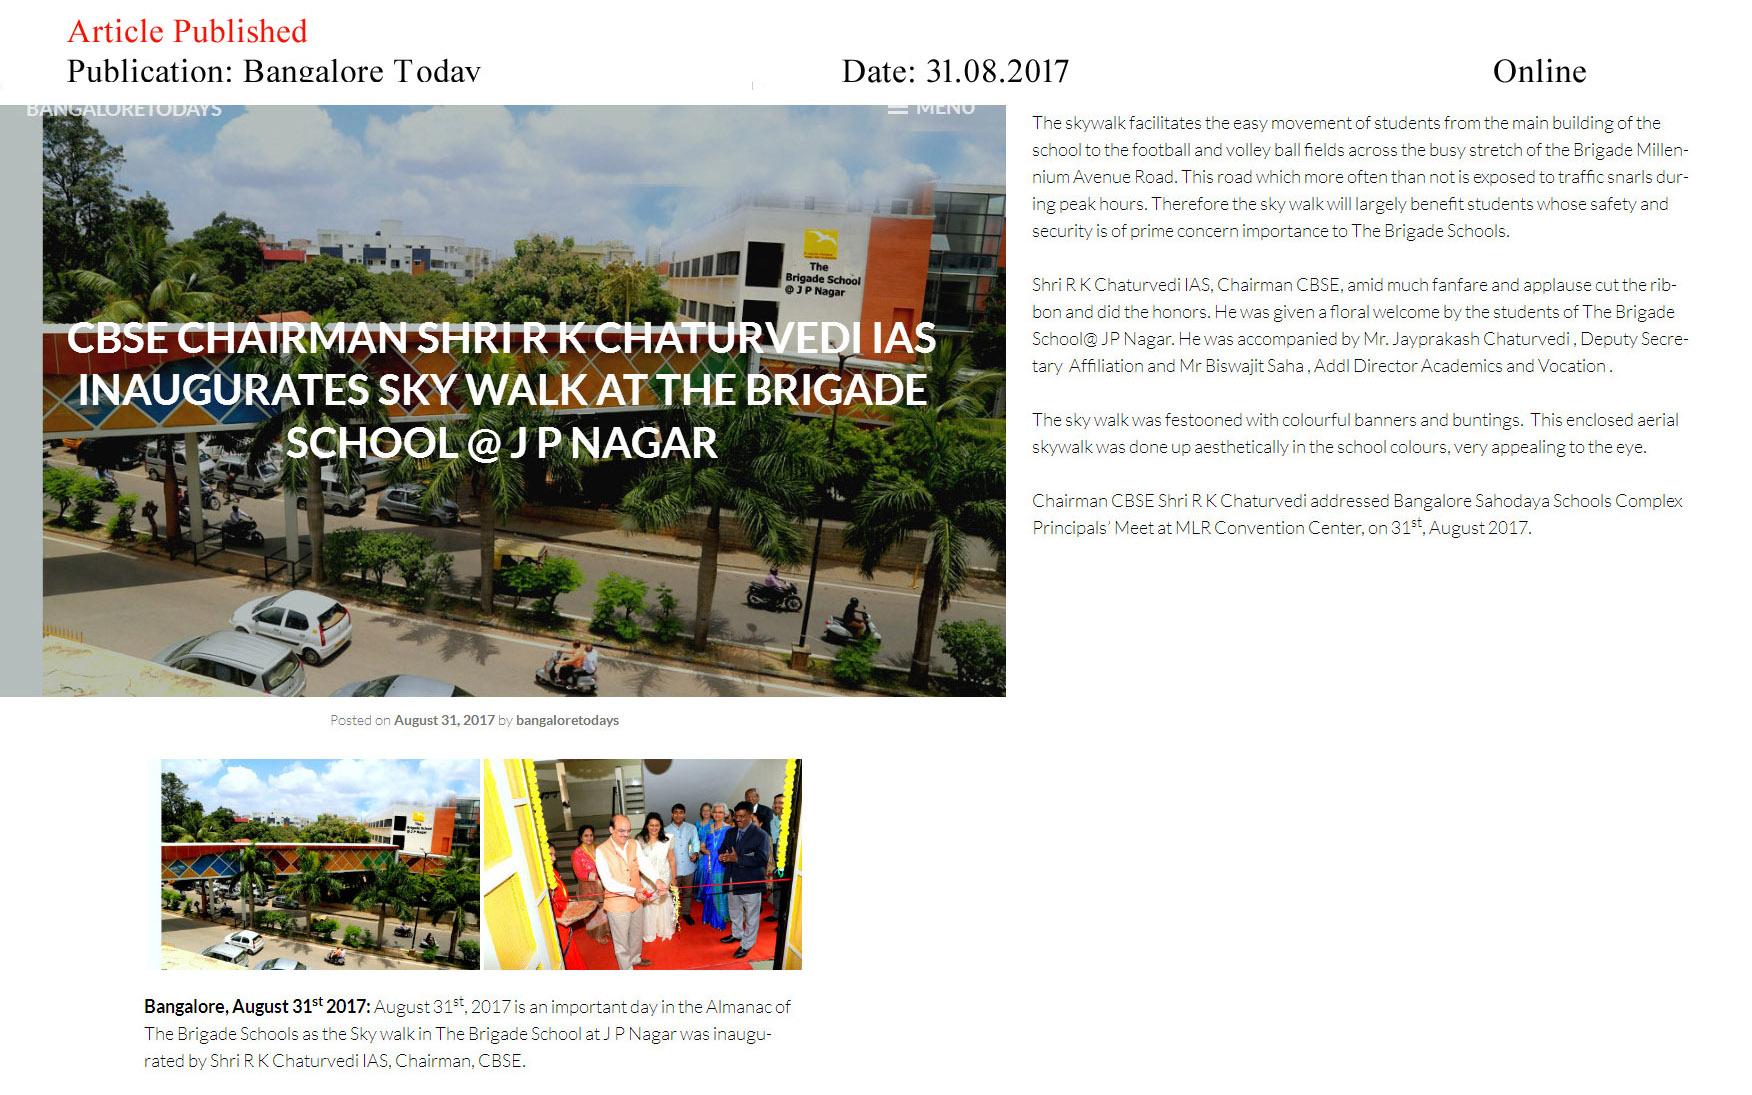 CBSE Chairman Shri R K Chaturvedi IAS inaugurates Sky Walk at The Brigade School @ J P Nagar—Bangalore Todays–Online